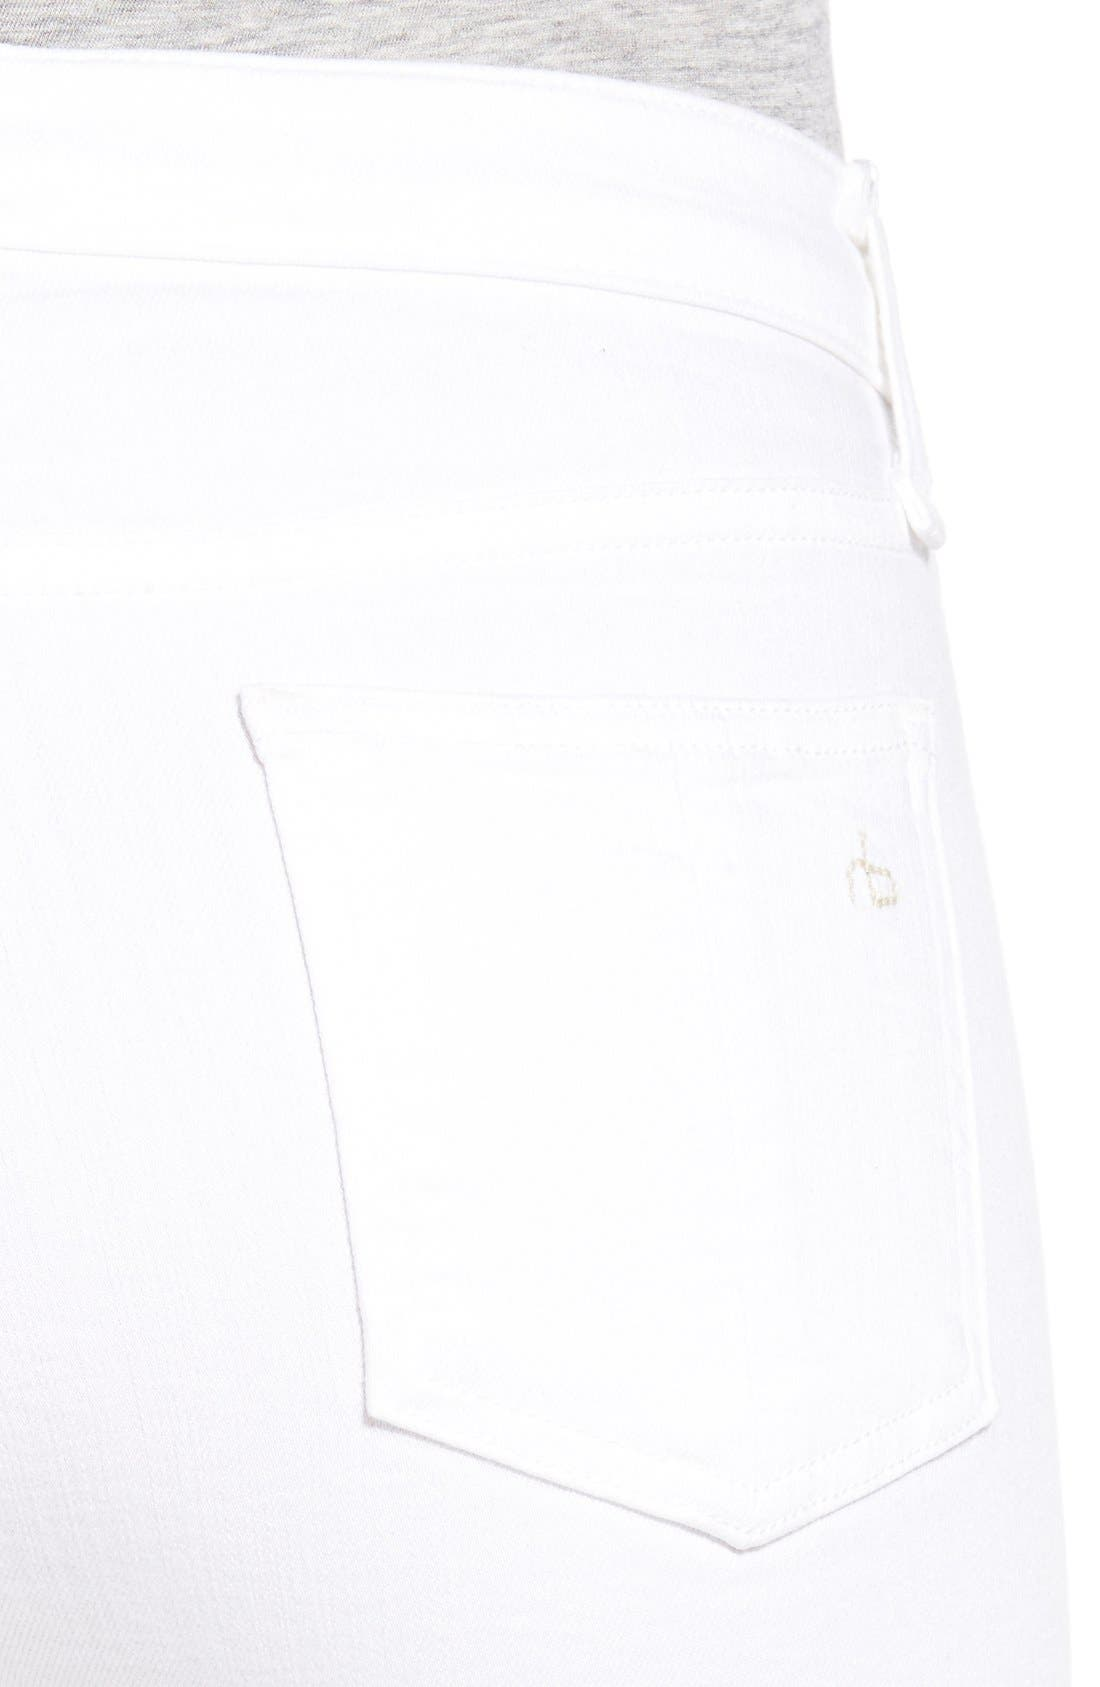 RAG & BONE, High Rise Raw Hem Crop Flare Jeans, Alternate thumbnail 4, color, BRIGHT WHITE